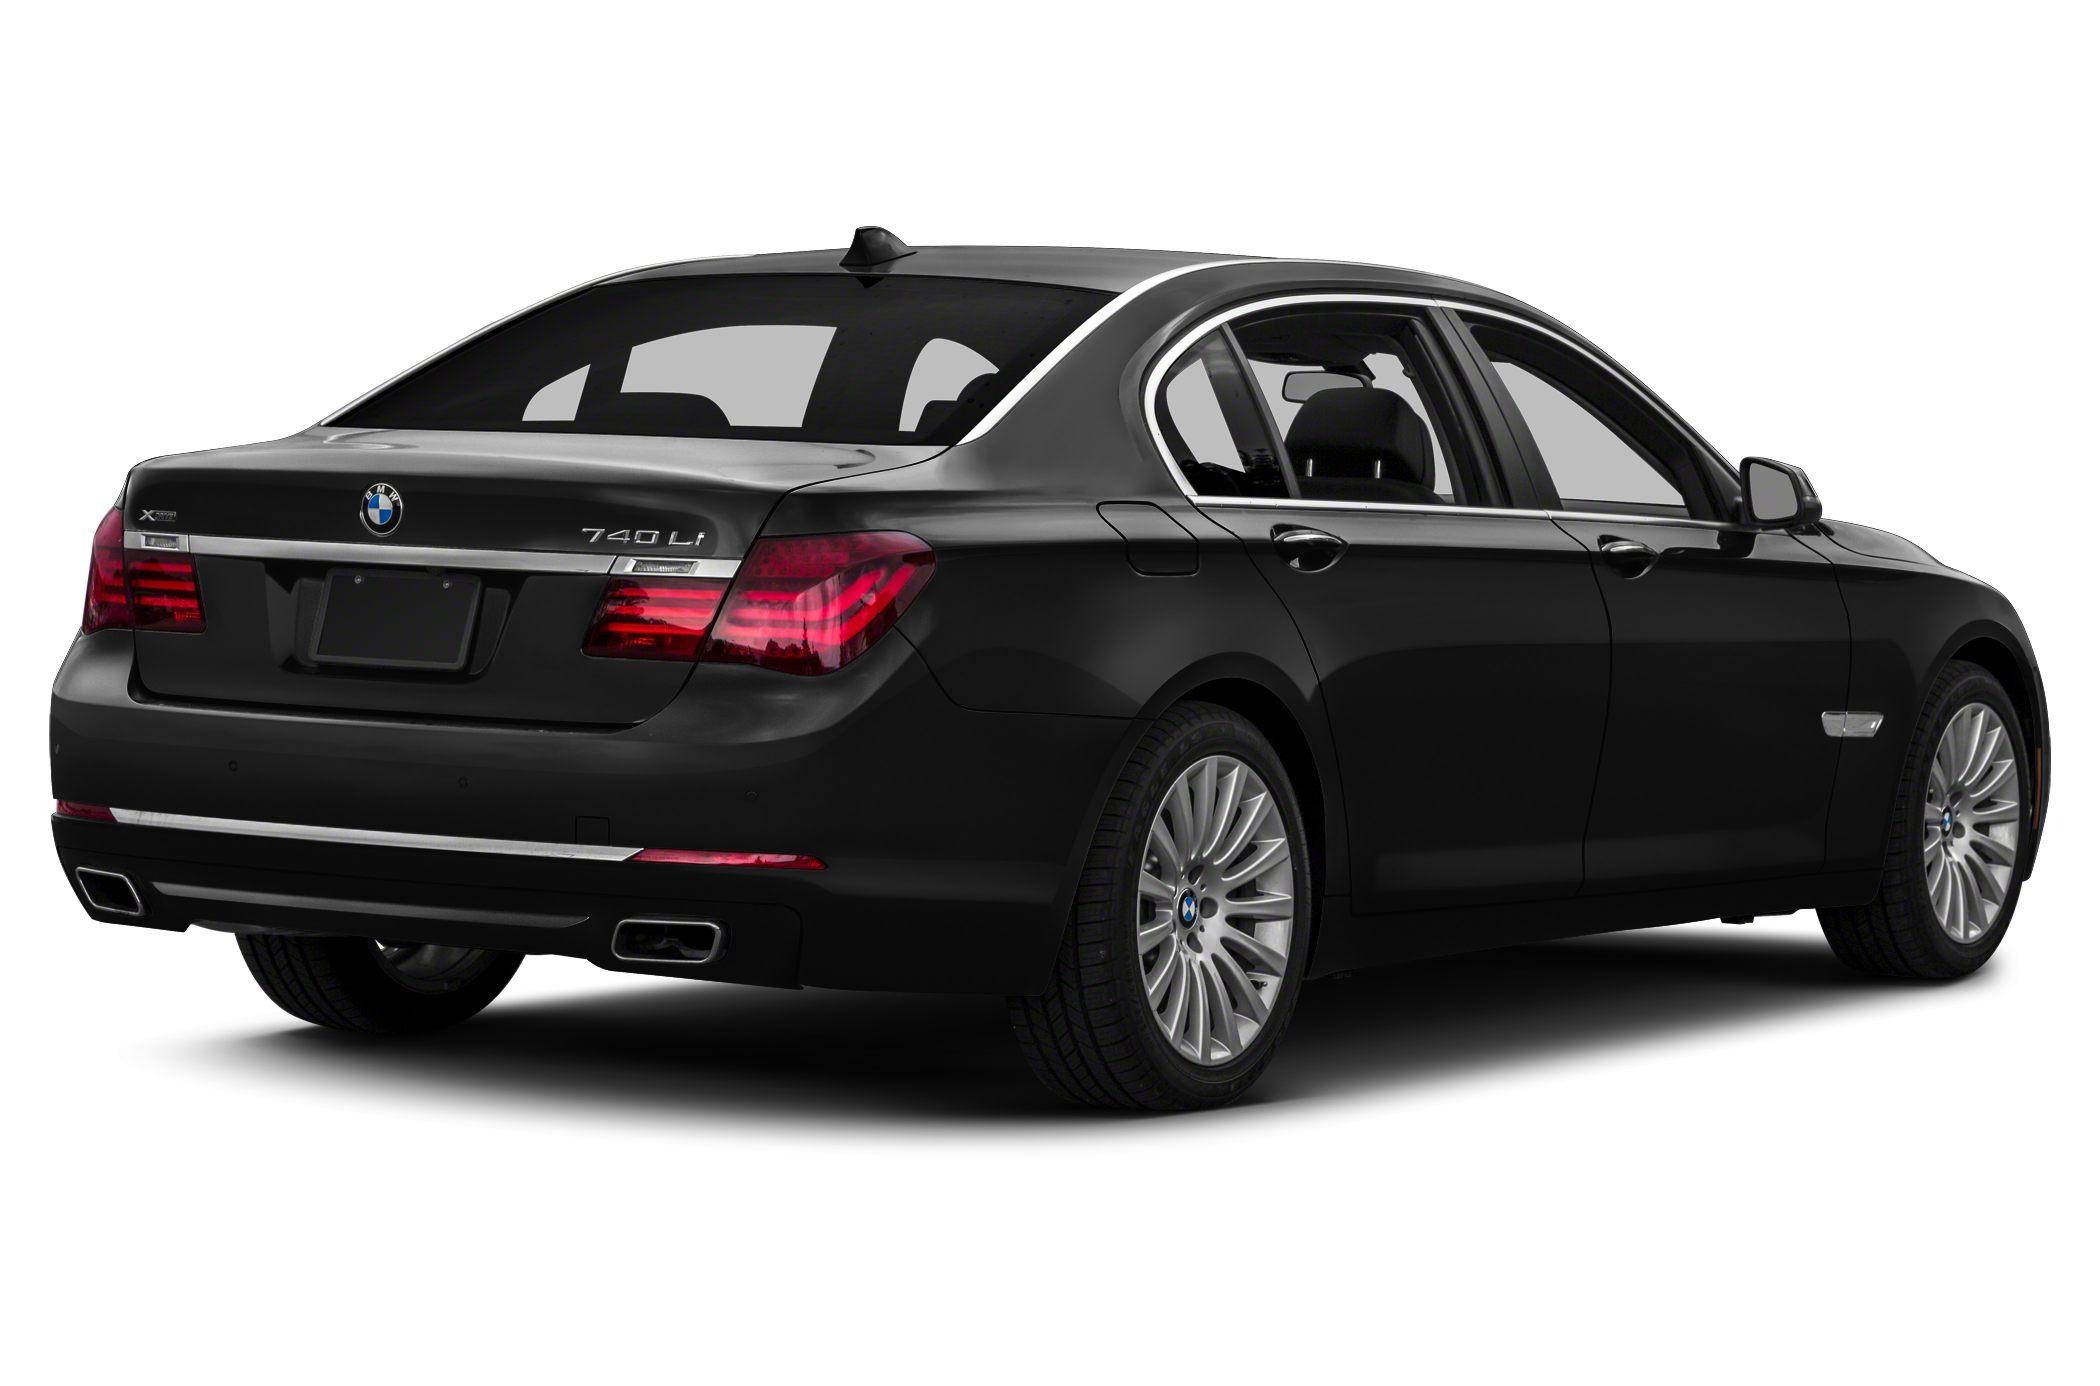 2015 BMW 7 Series 740Li xDrive 3-DAY EXCHANGEONE PRICE STOP NO HASSLE NO HAGGLE CAR BUYING